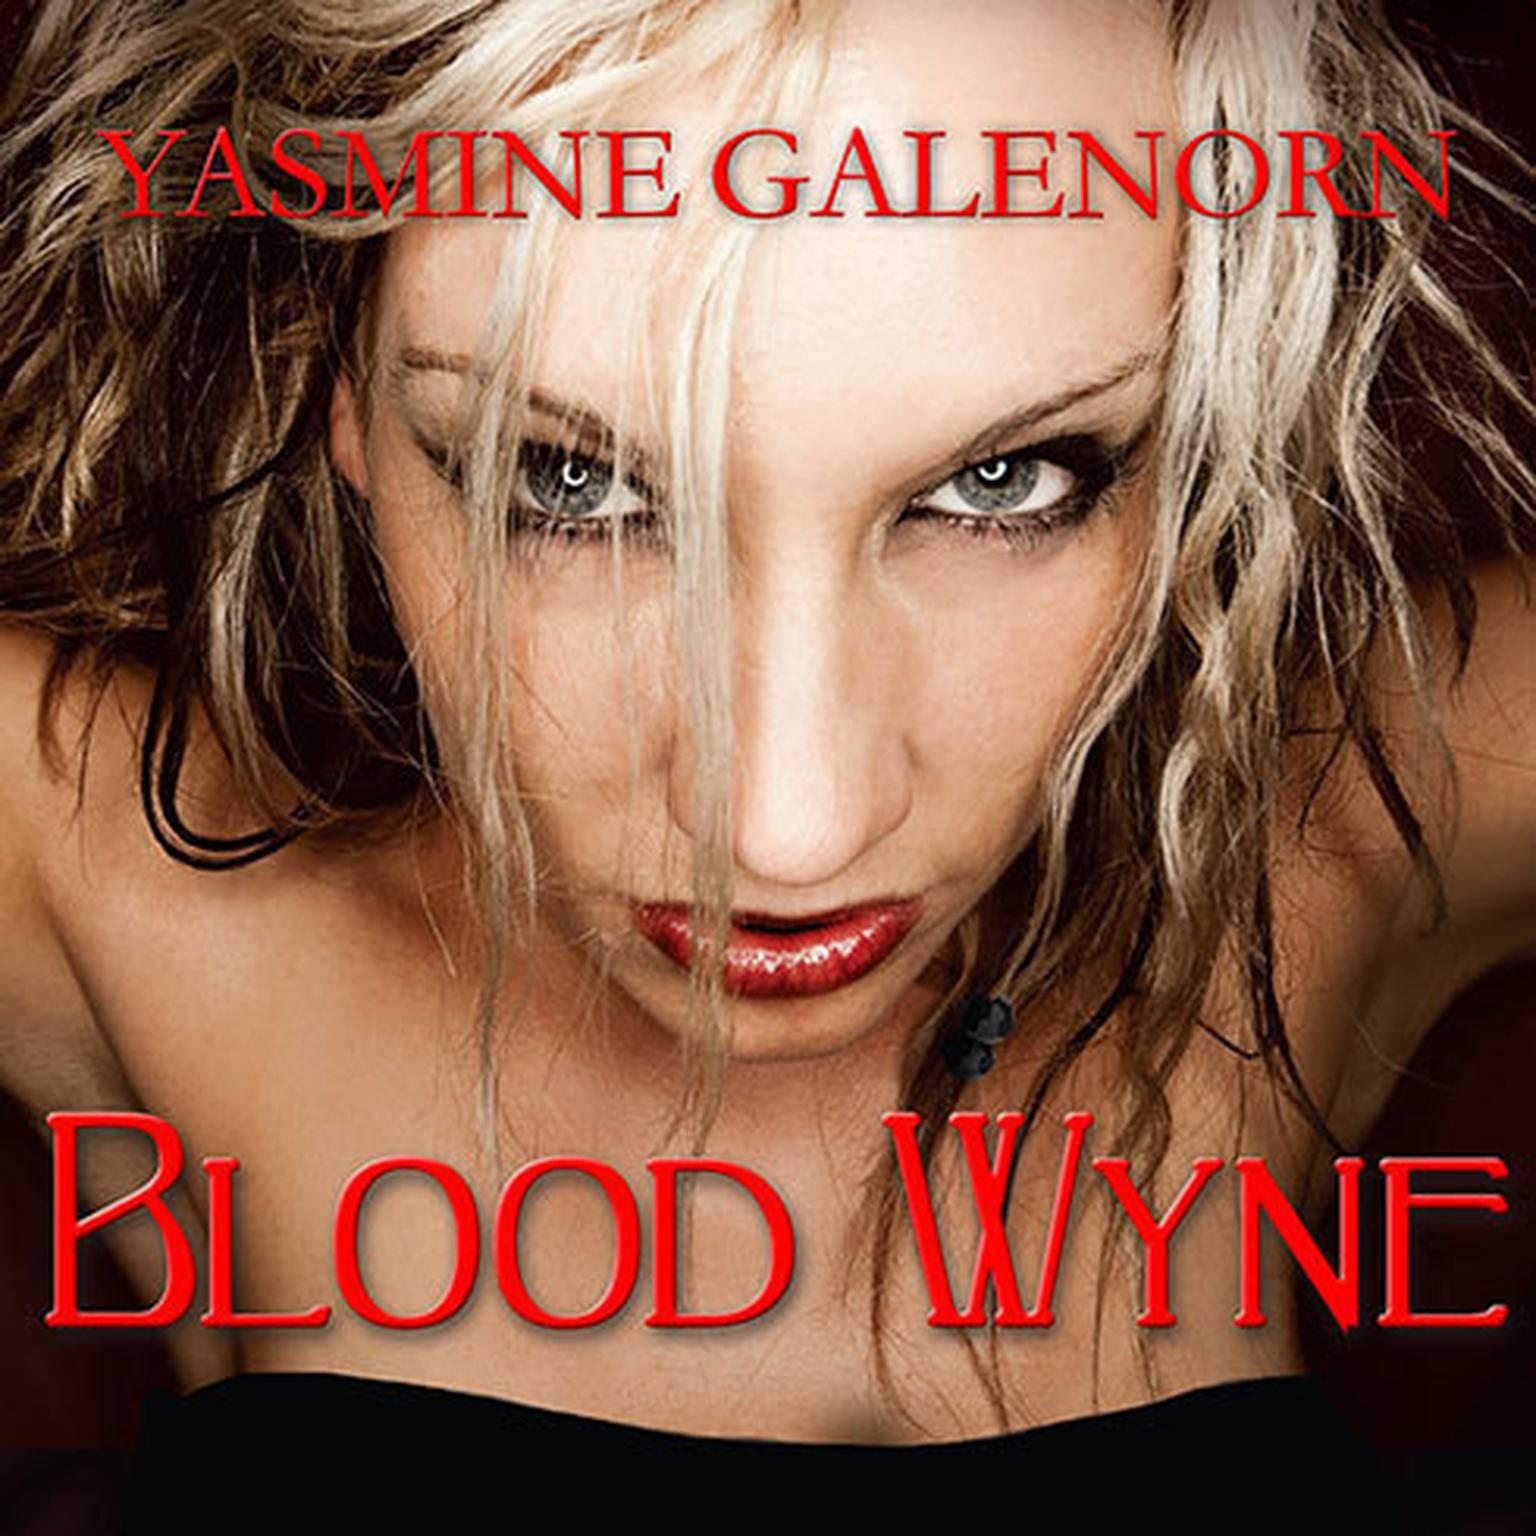 Printable Blood Wyne Audiobook Cover Art